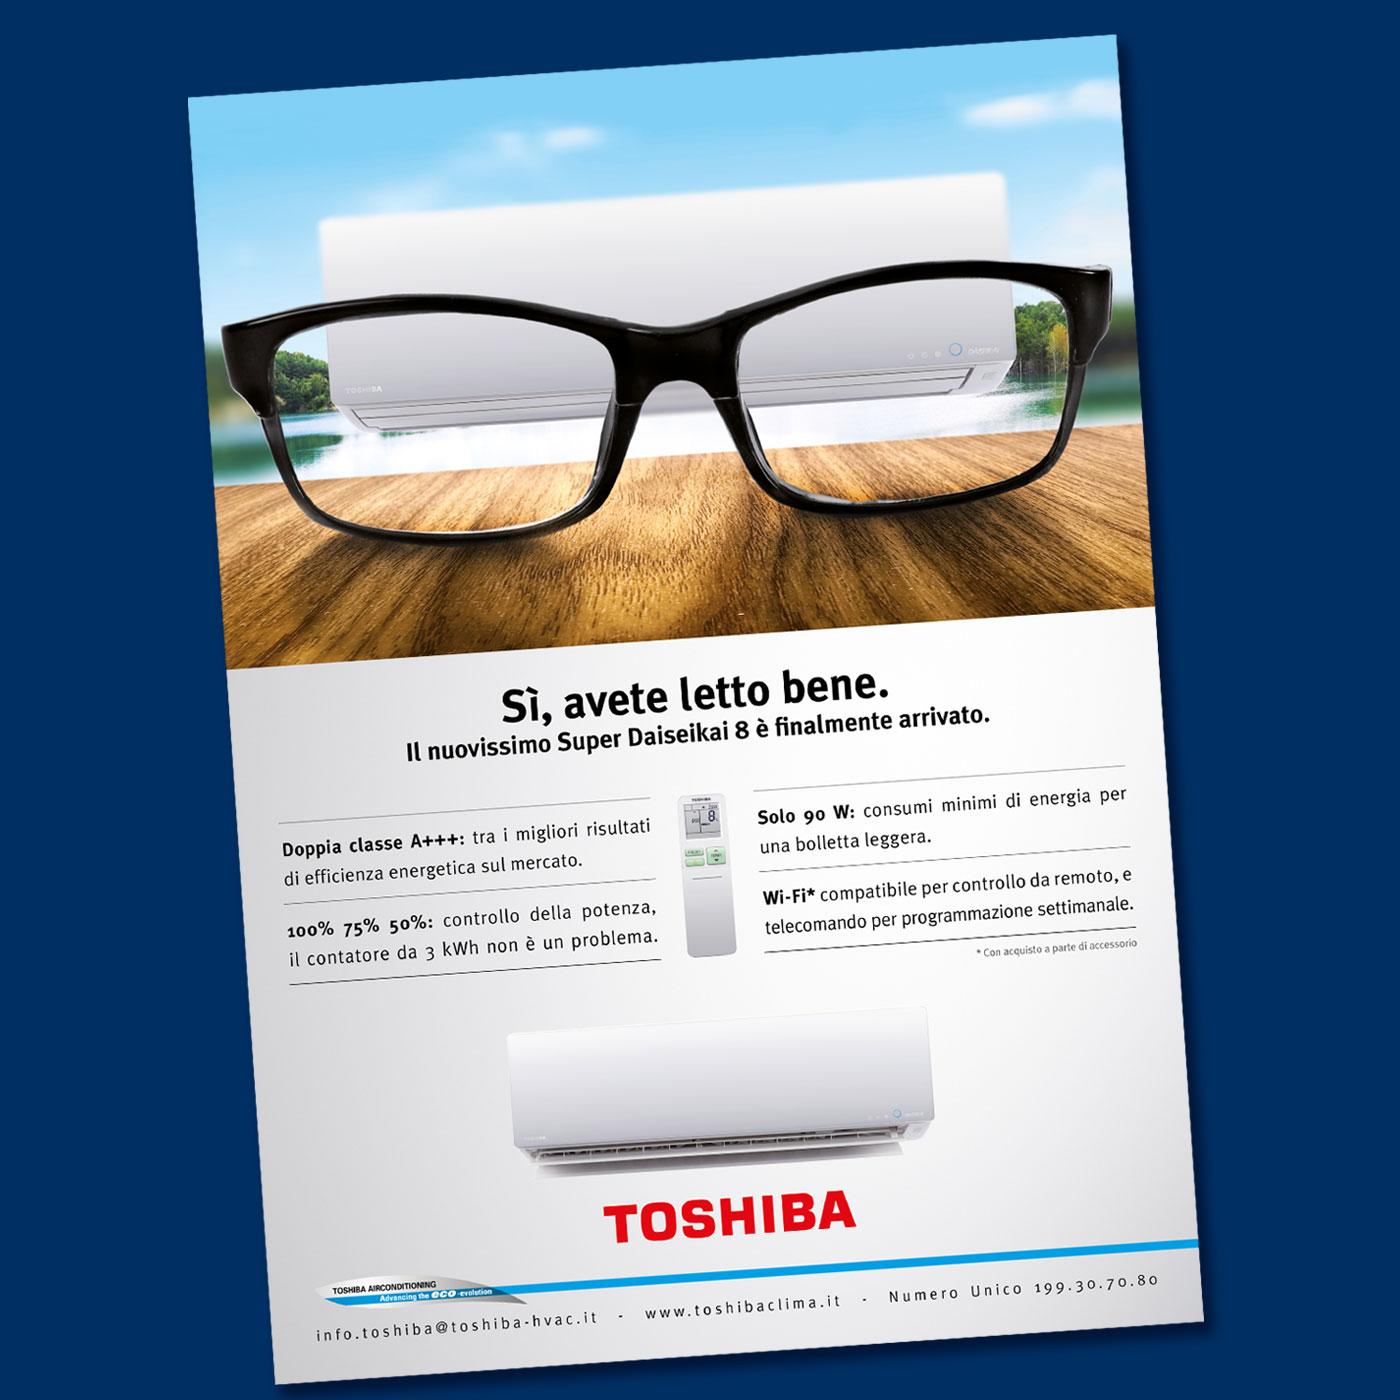 Toshiba SDSK8